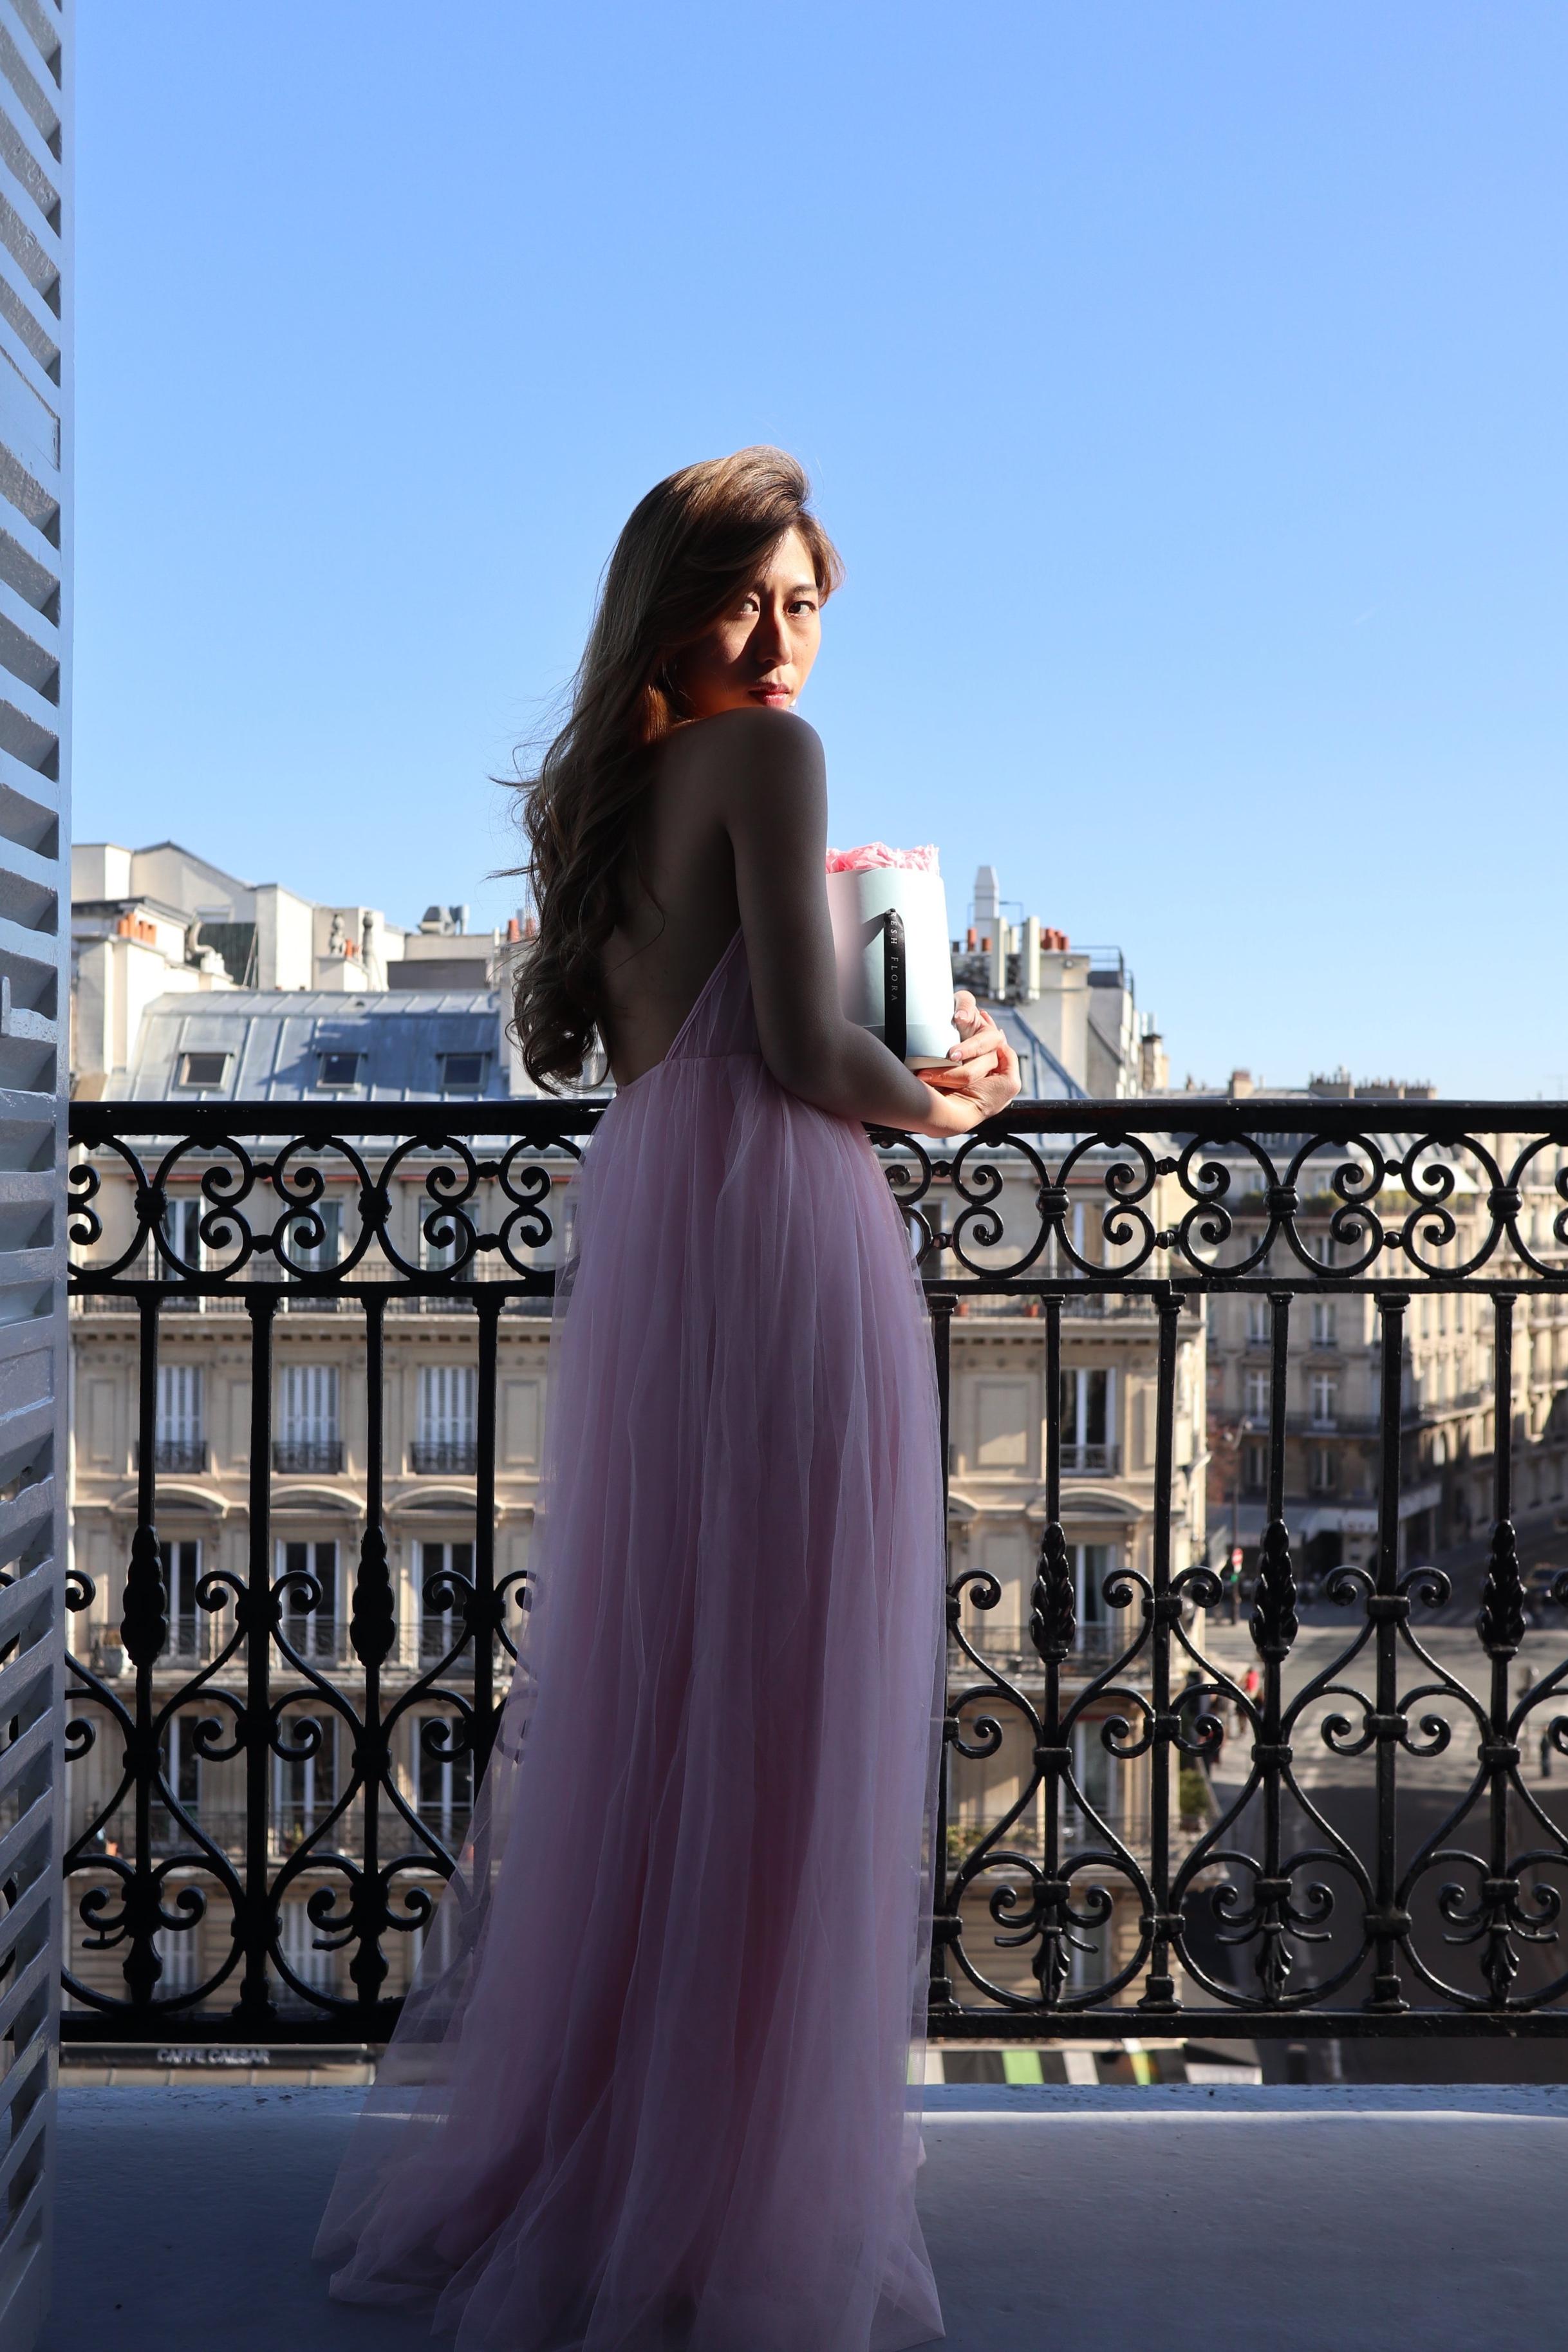 #FollowDearPostmanTo Paris: 24 Hours in Paris